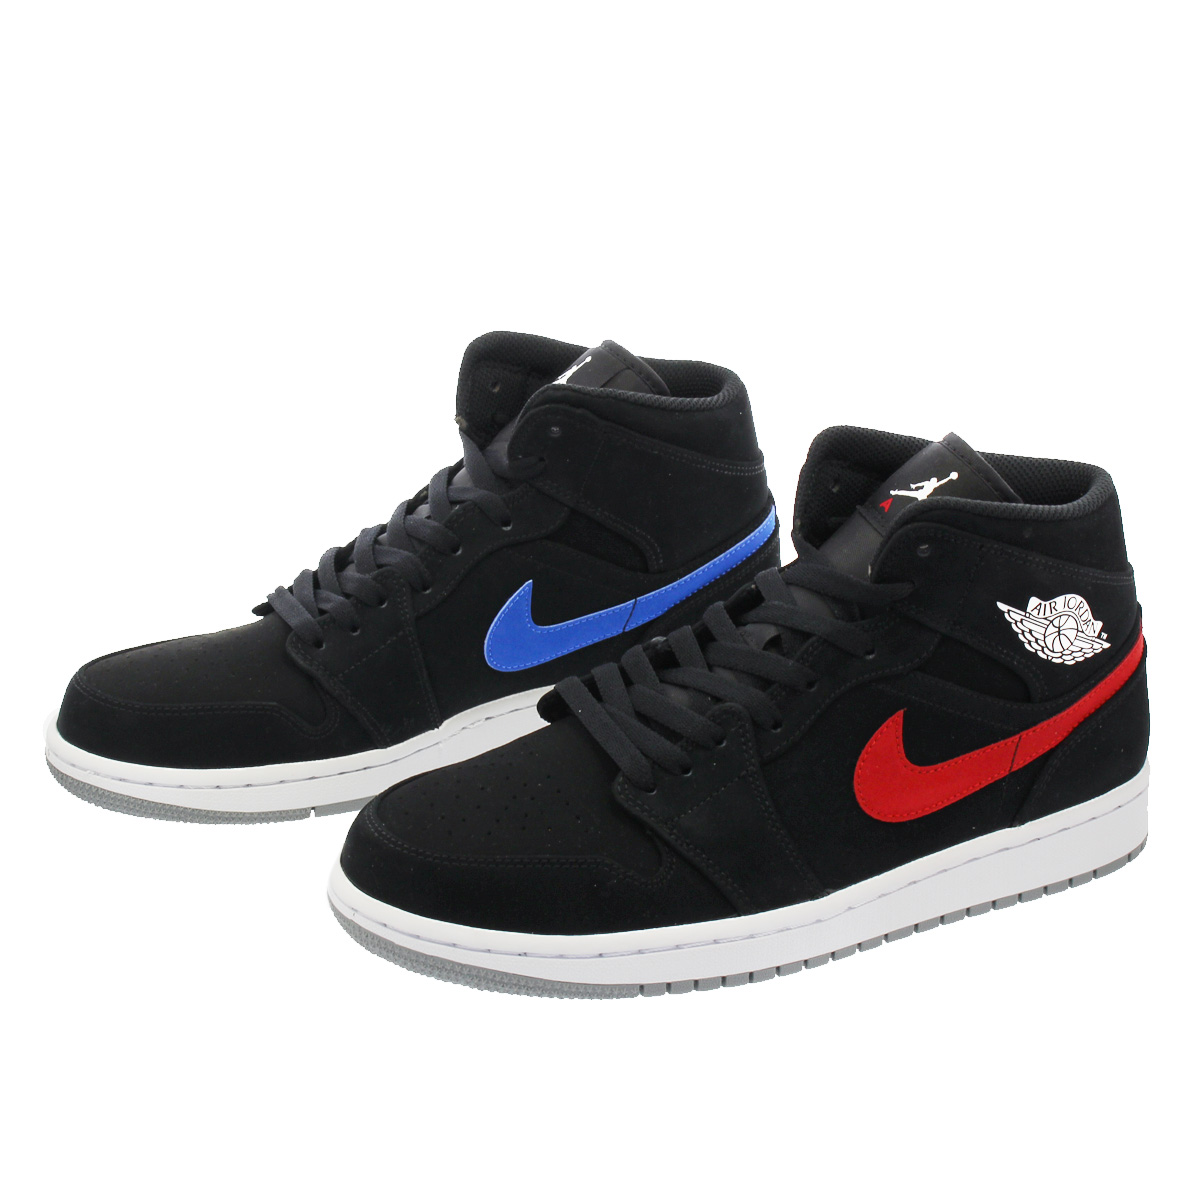 SELECT SHOP LOWTEX | Rakuten Global Market: NIKE AIR JORDAN 1 MID Nike Air Jordan 1 mid BLACK/MULTI COLOR/RED/BLUE 554,724-065